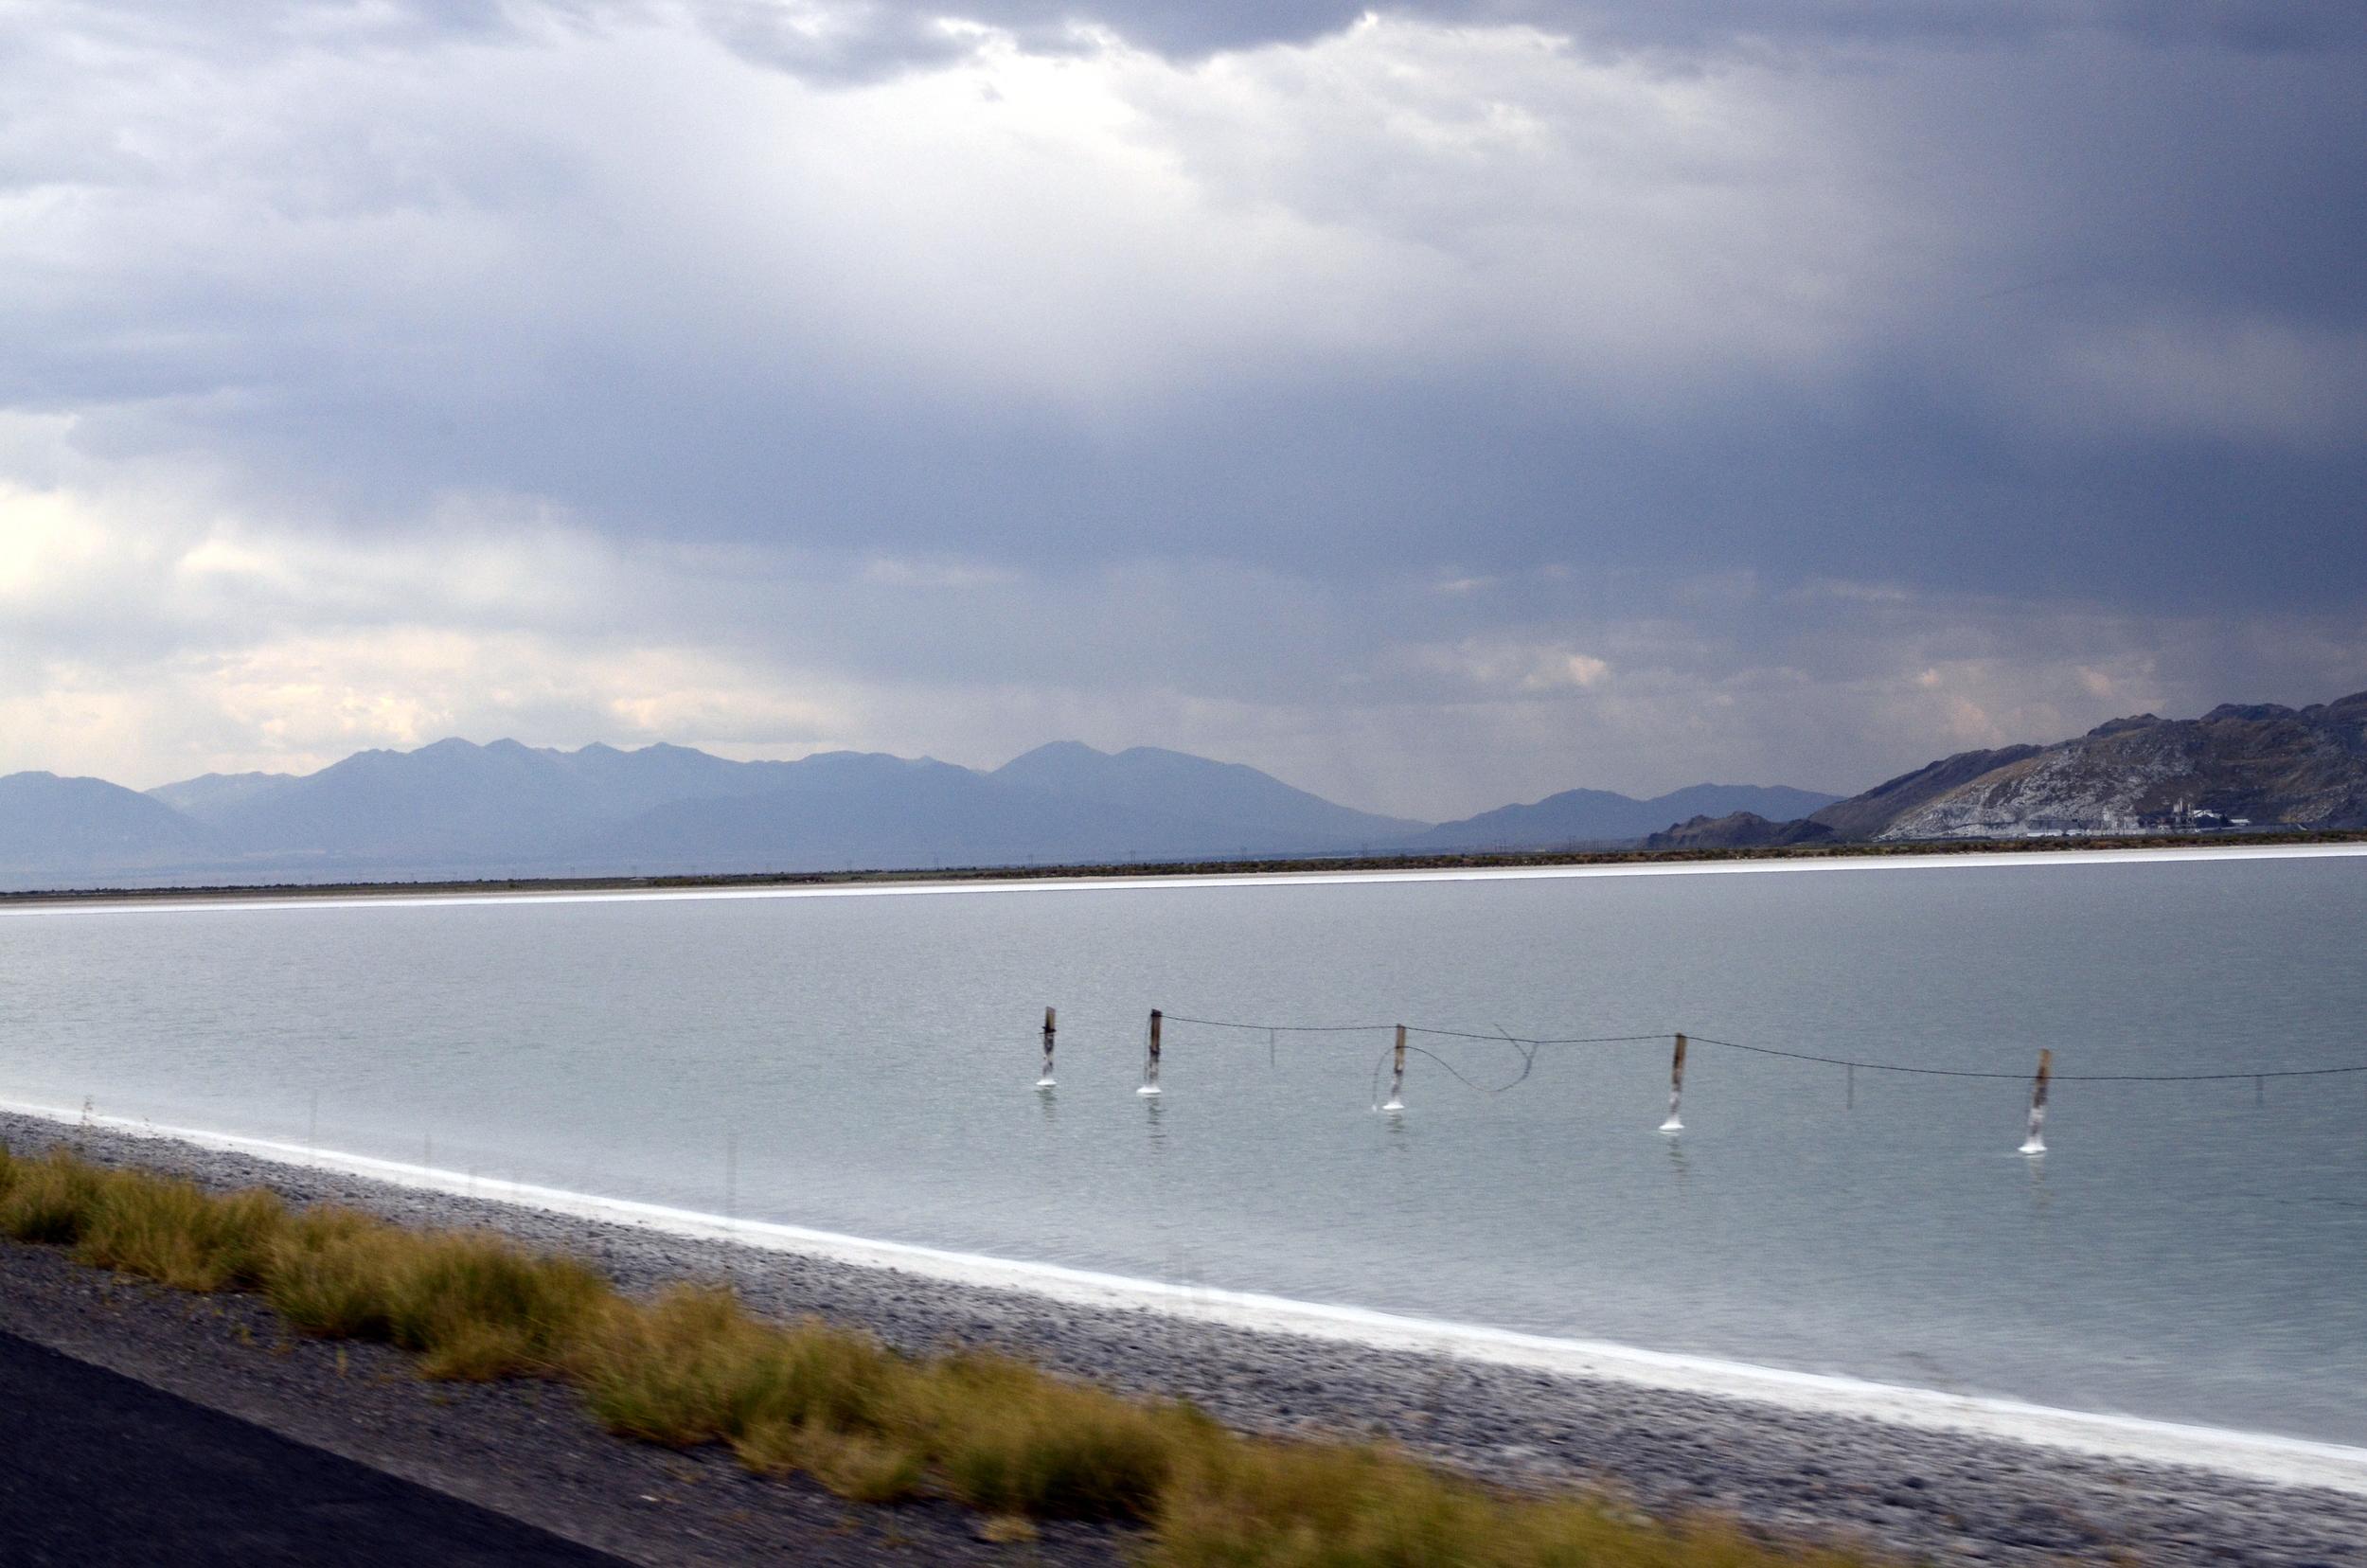 009 The Great Salt Lake.jpg